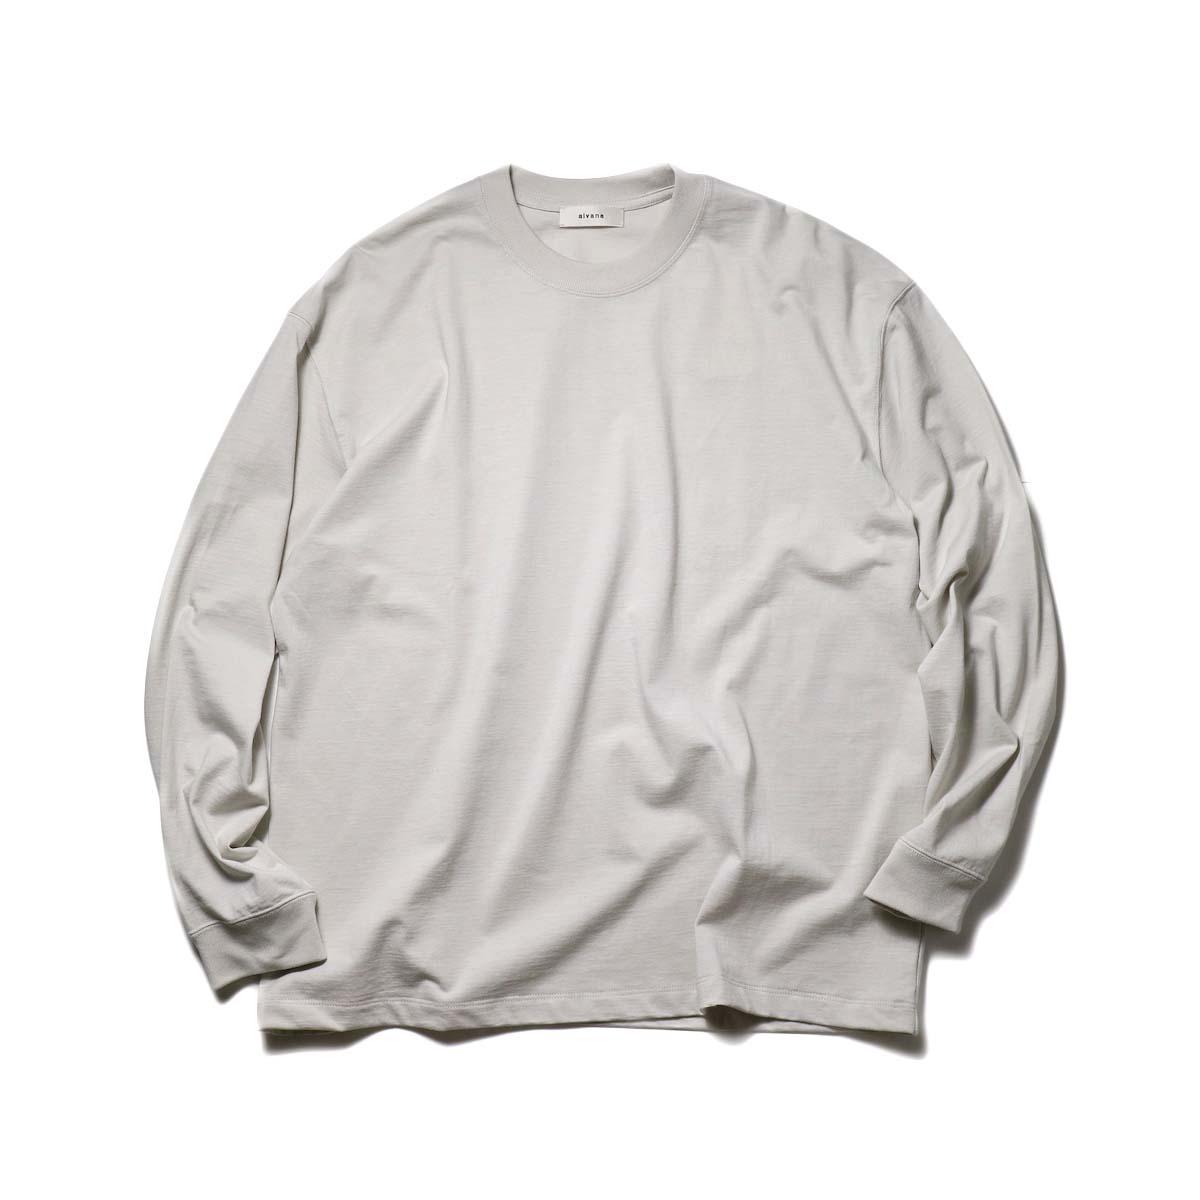 alvana / TANGUIS L/S TEE SHIRTS (Ecru Gray)正面